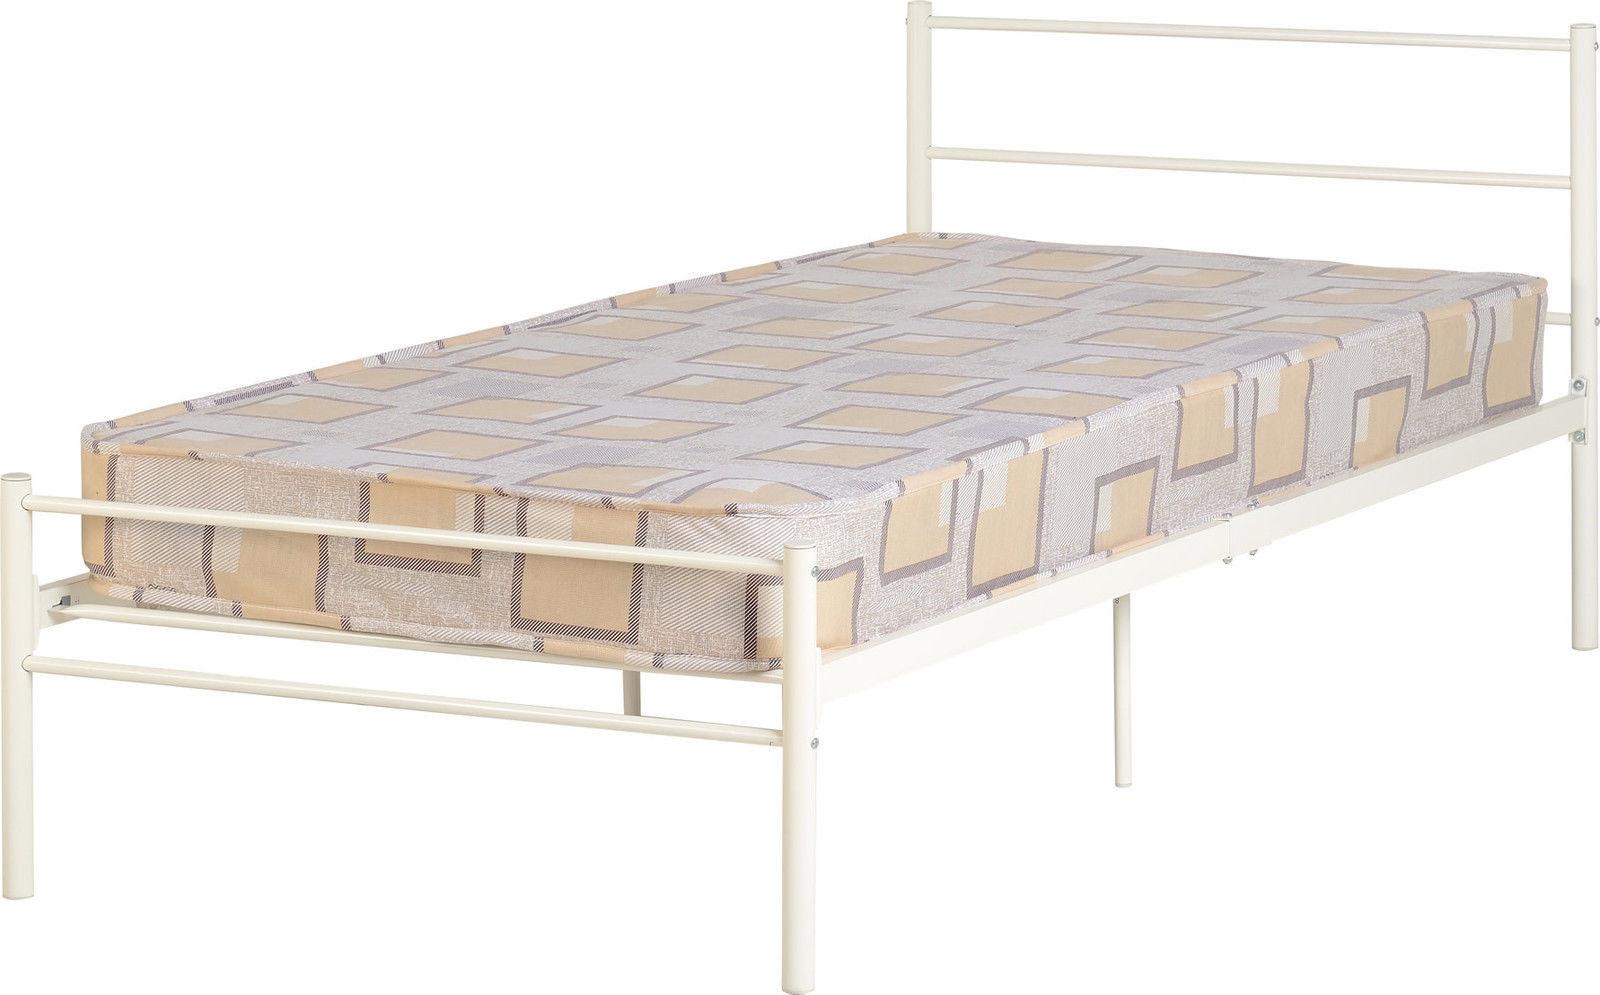 Details about Devon Metal Single Bed 3ft 90cm - White